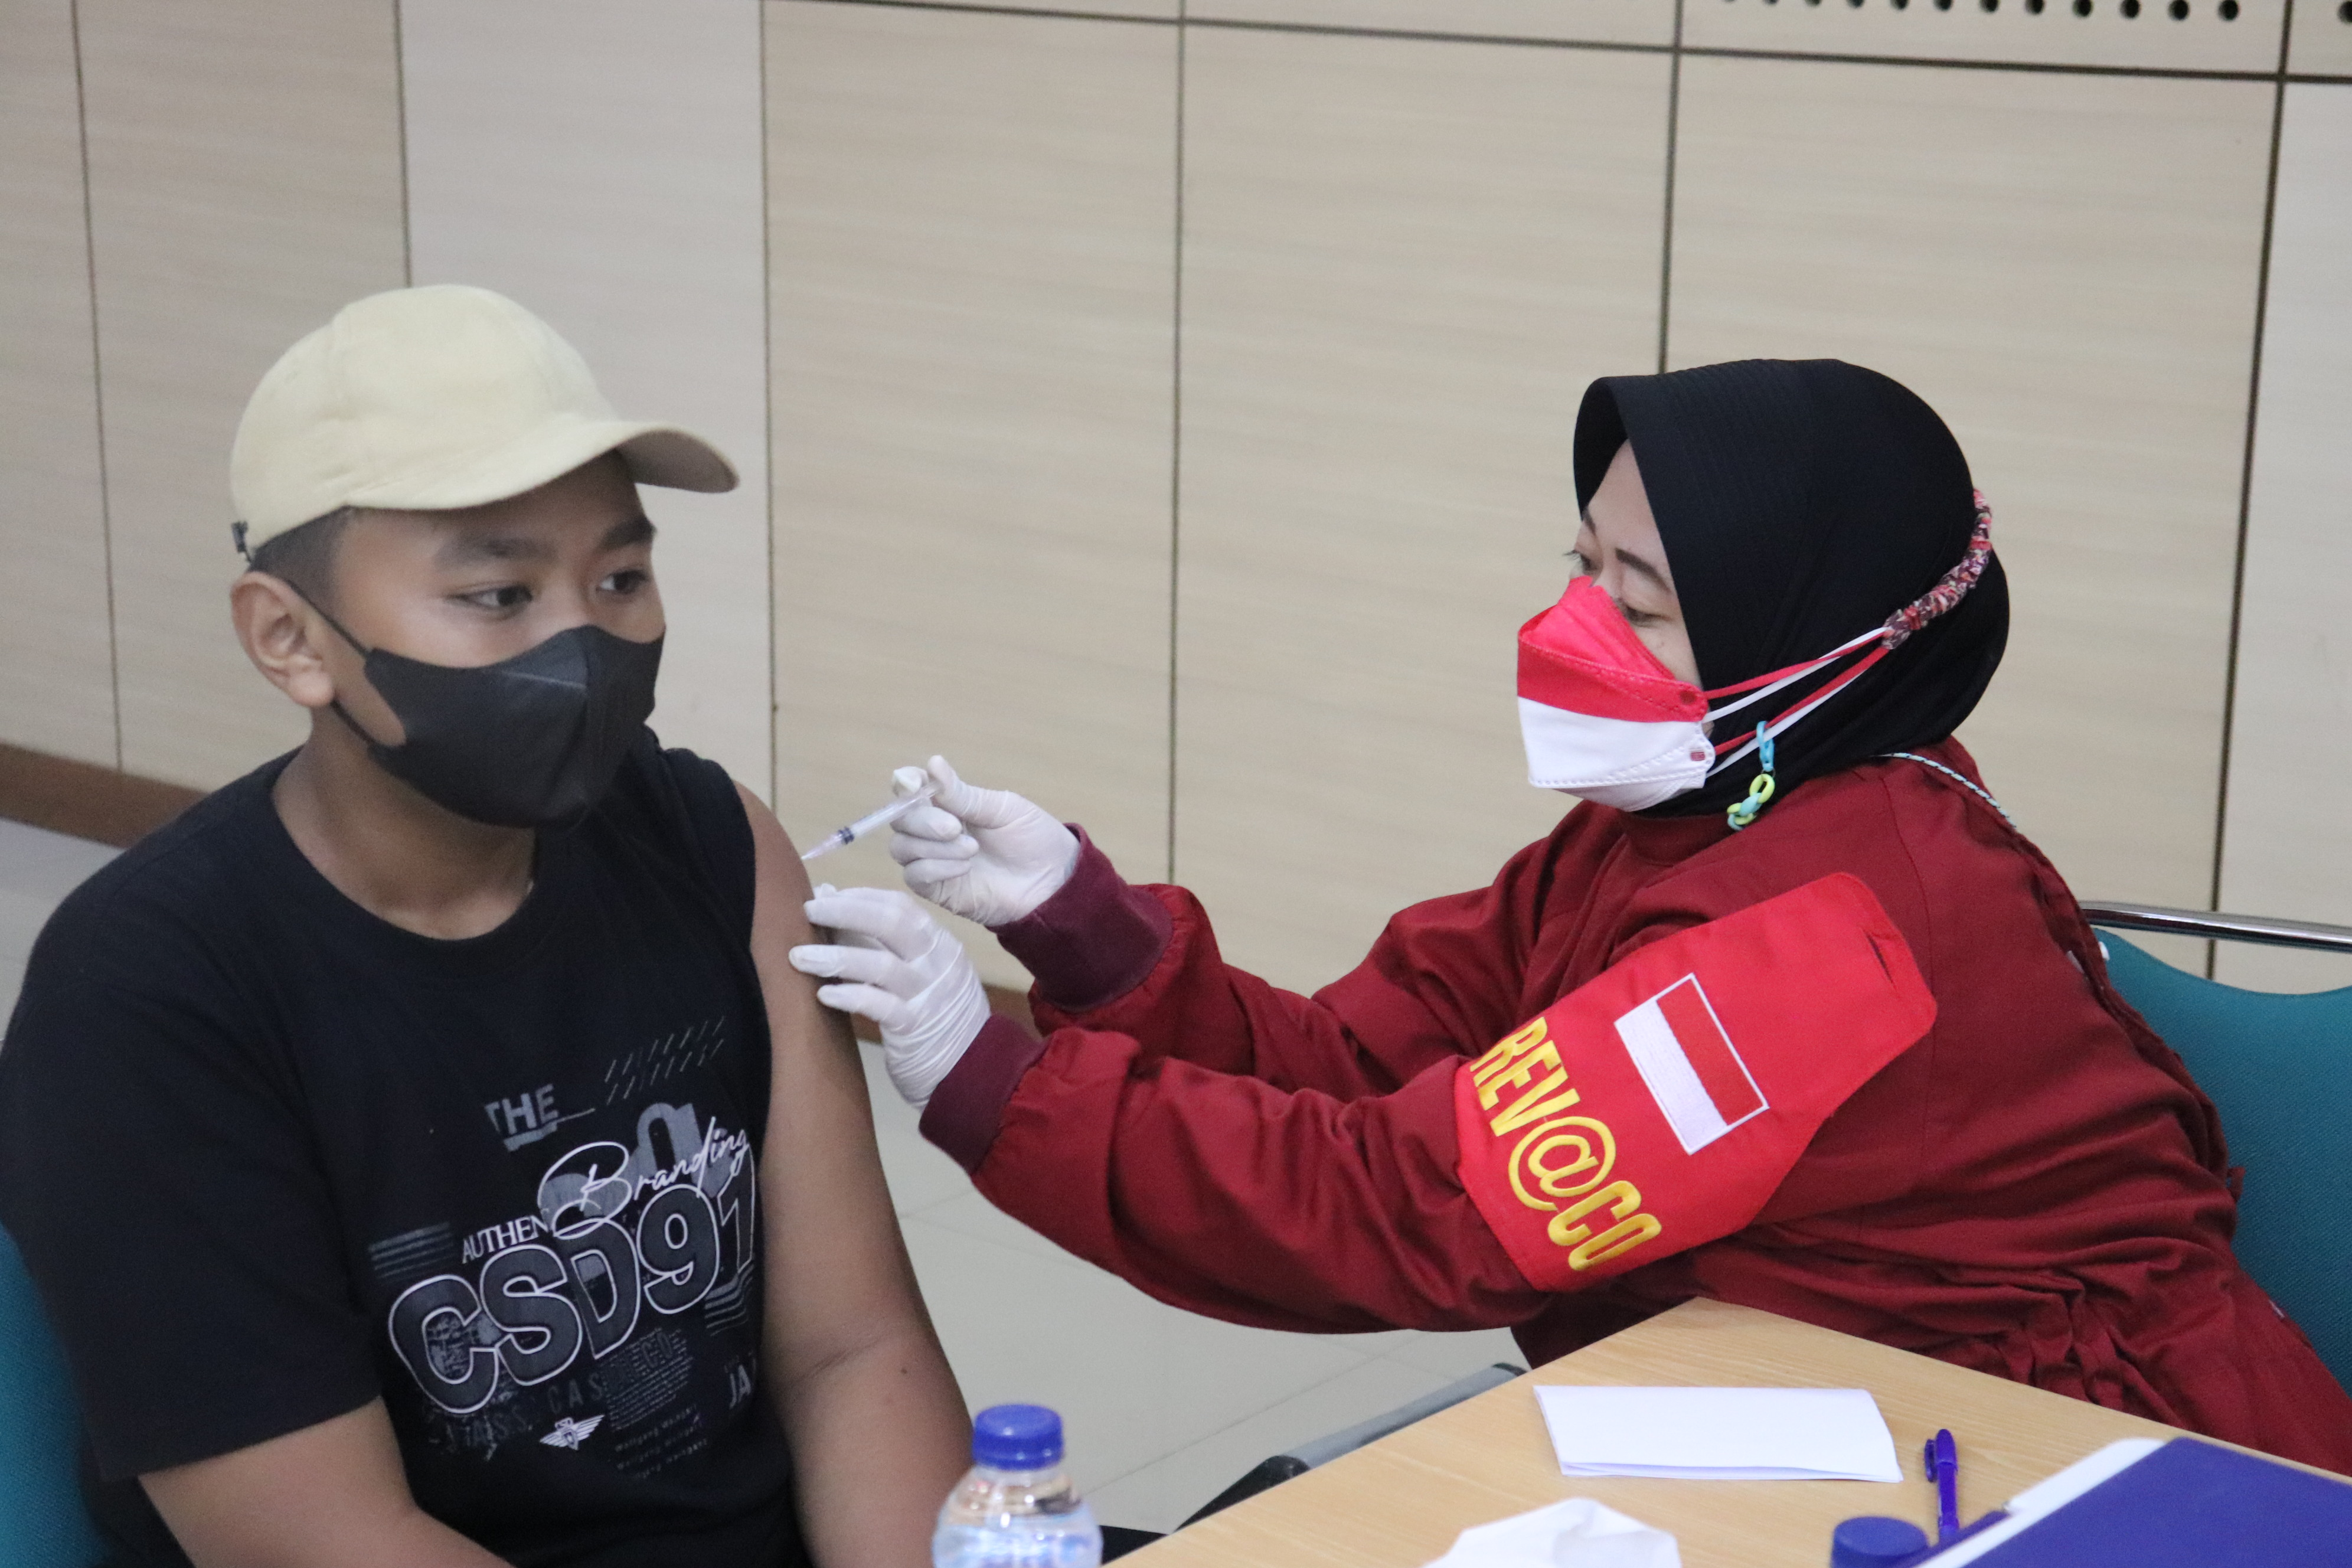 UNJ Gelar Vaksinasi Massal Dosis Kedua, Abdul Sukur : Proses Berjalan Lancar dan Rapih Tanpa Ada Masalah